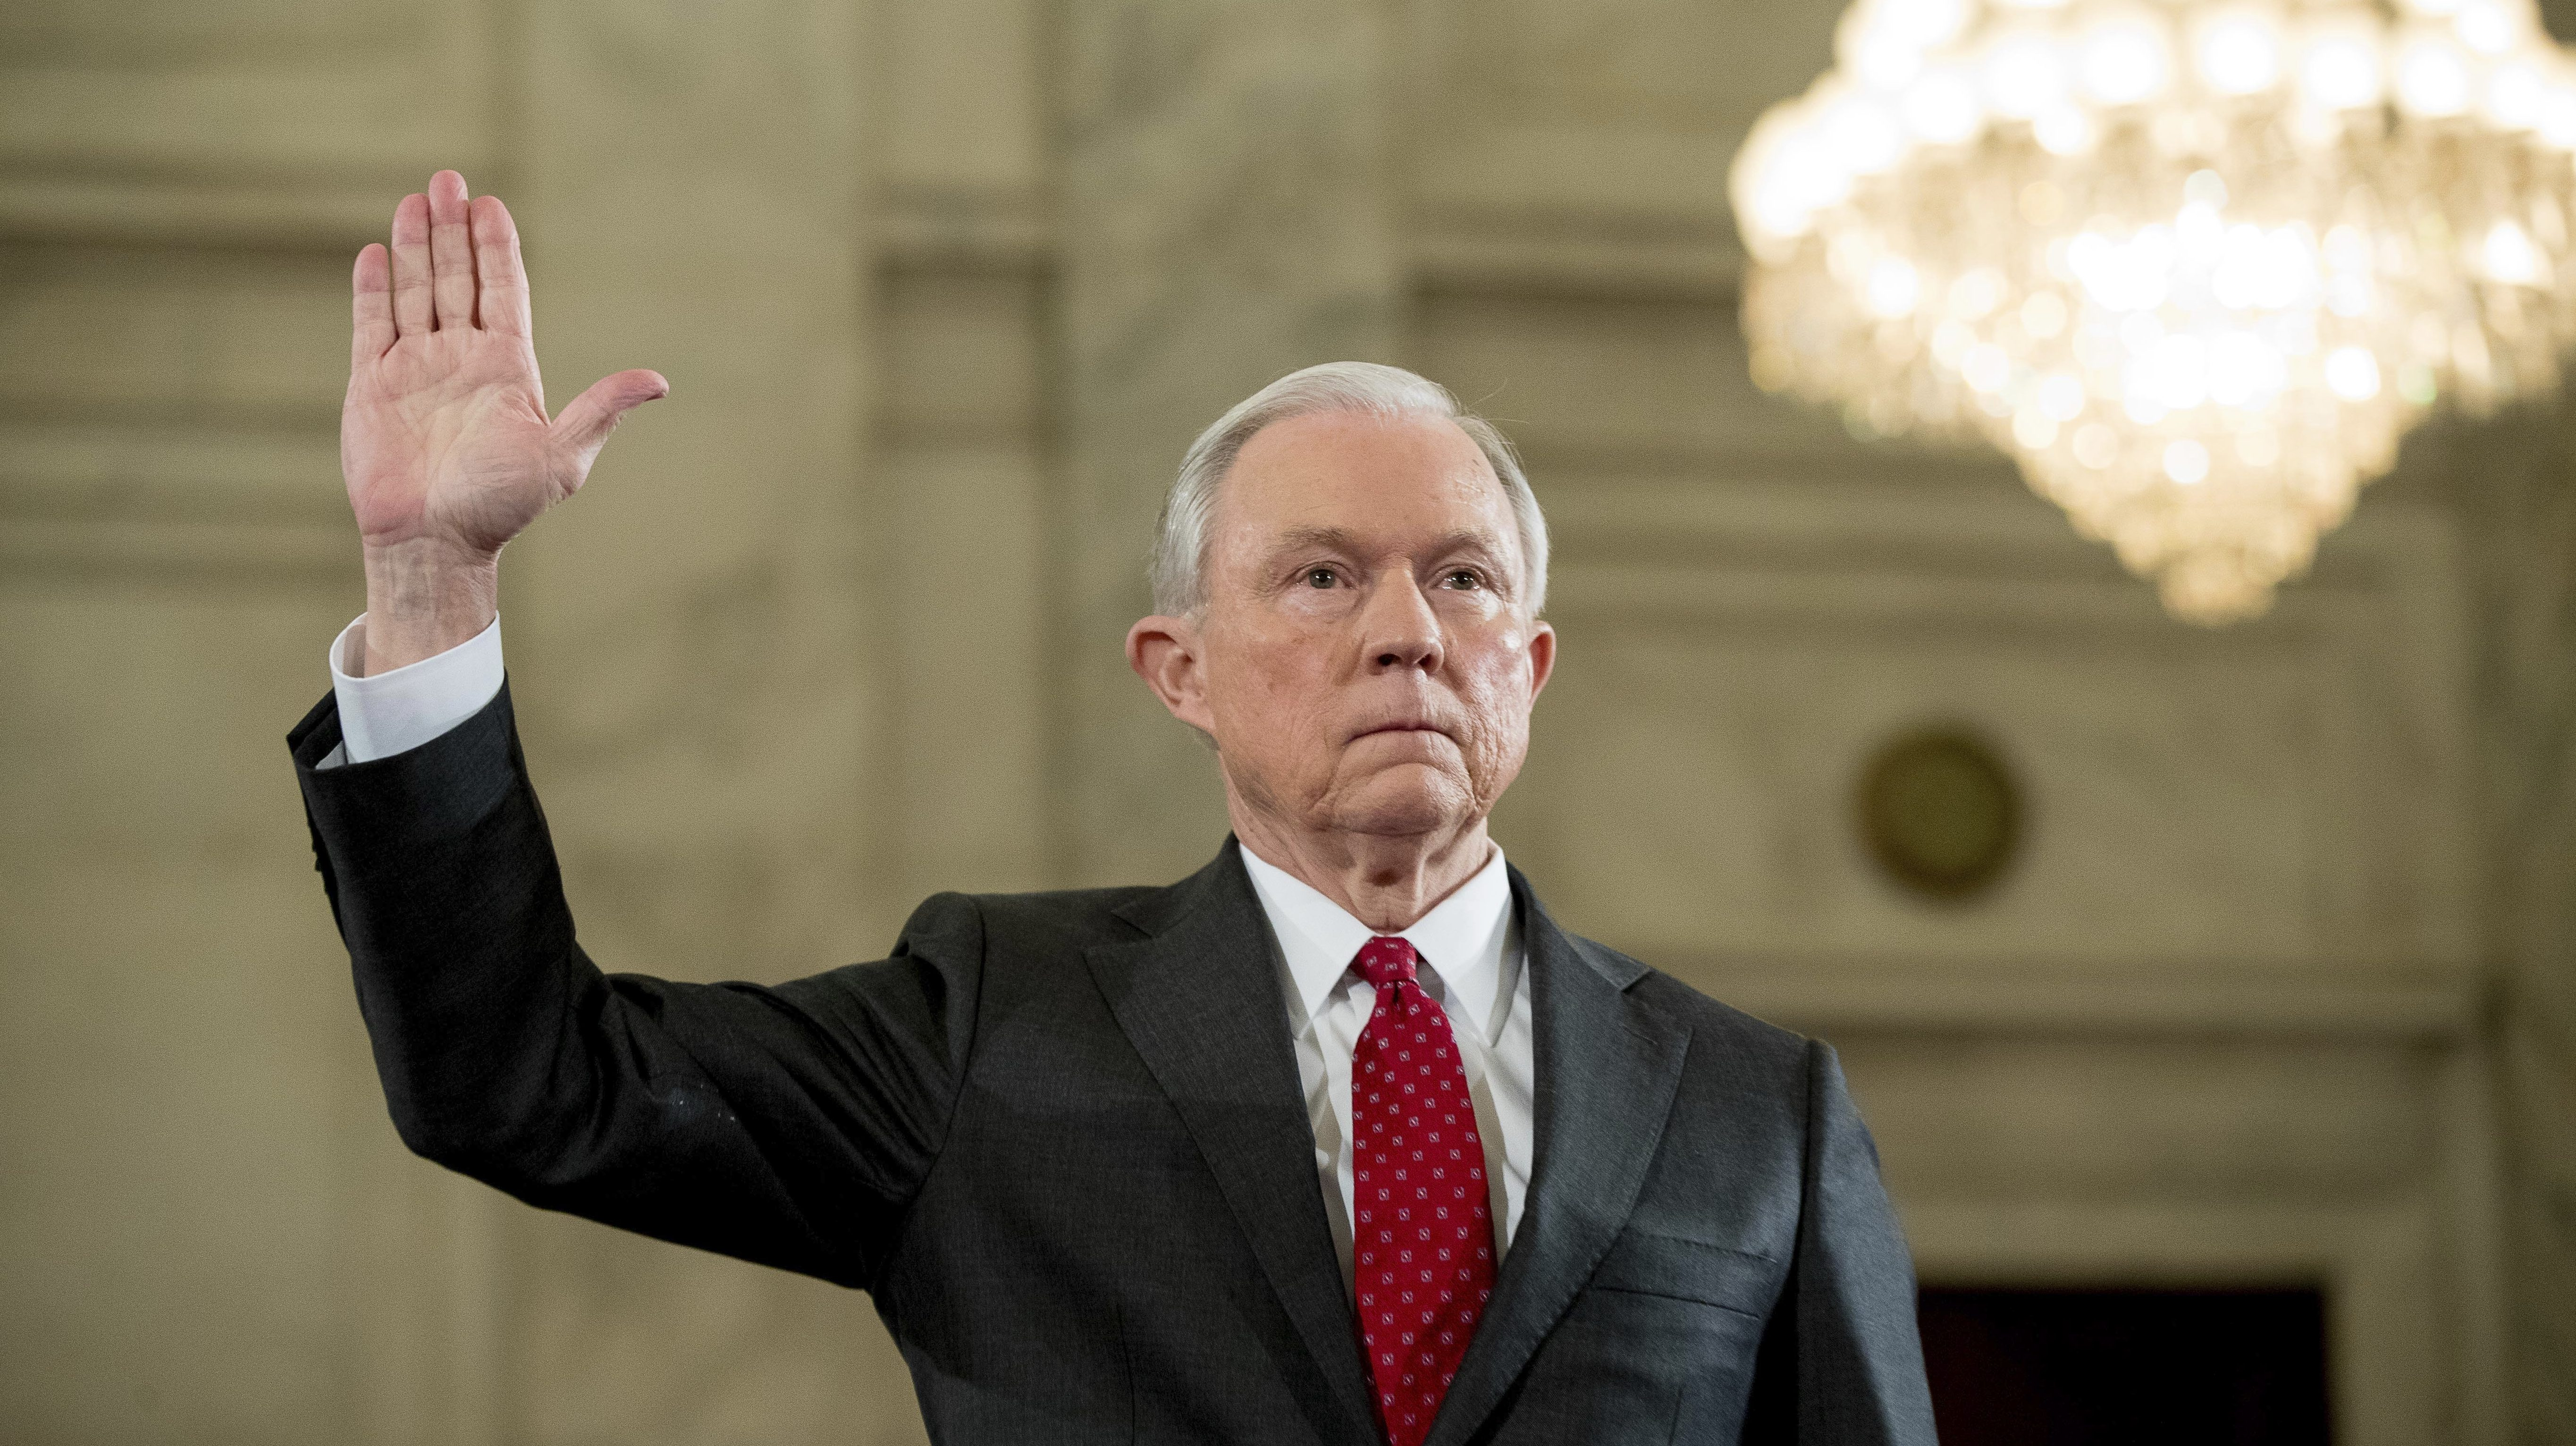 Attorney General-designate, Sen. Jeff Sessions, R-Ala. is sworn in on Capitol Hill in Washington